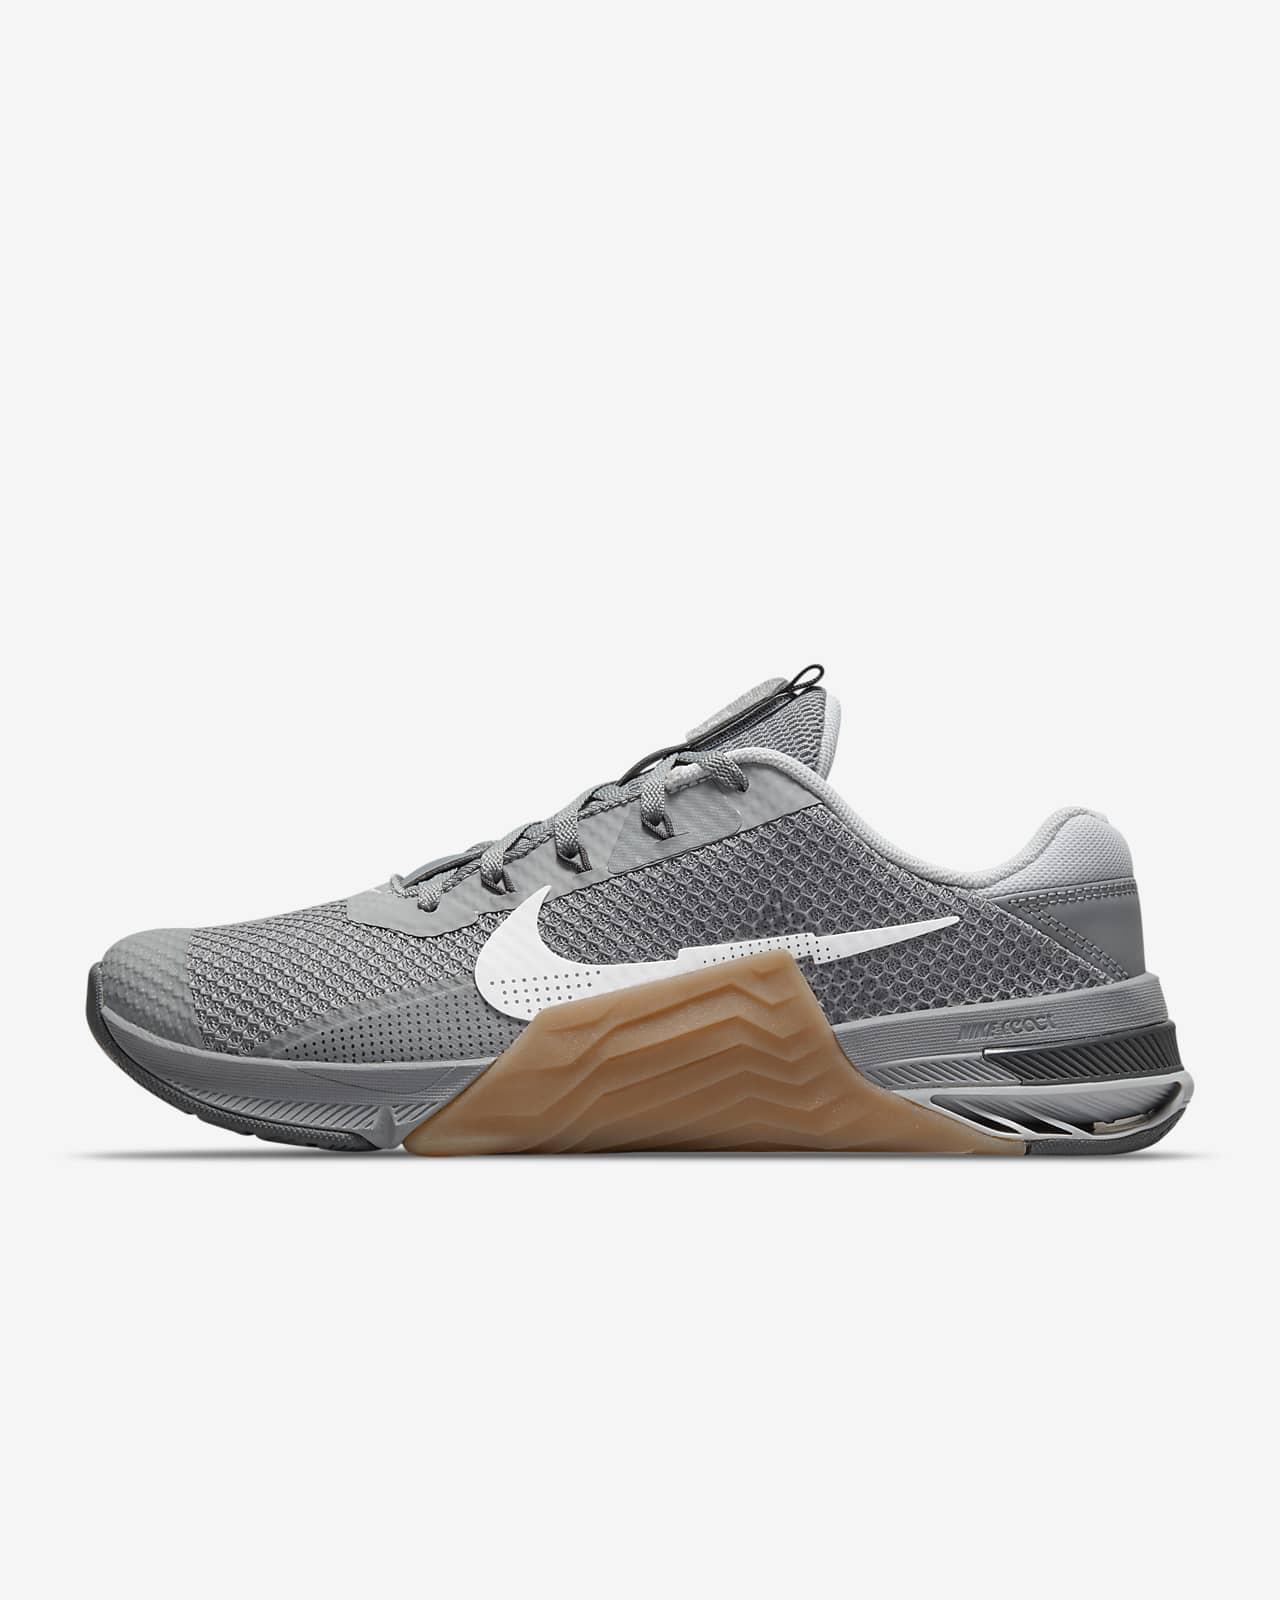 Tréninková boty Nike Metcon7